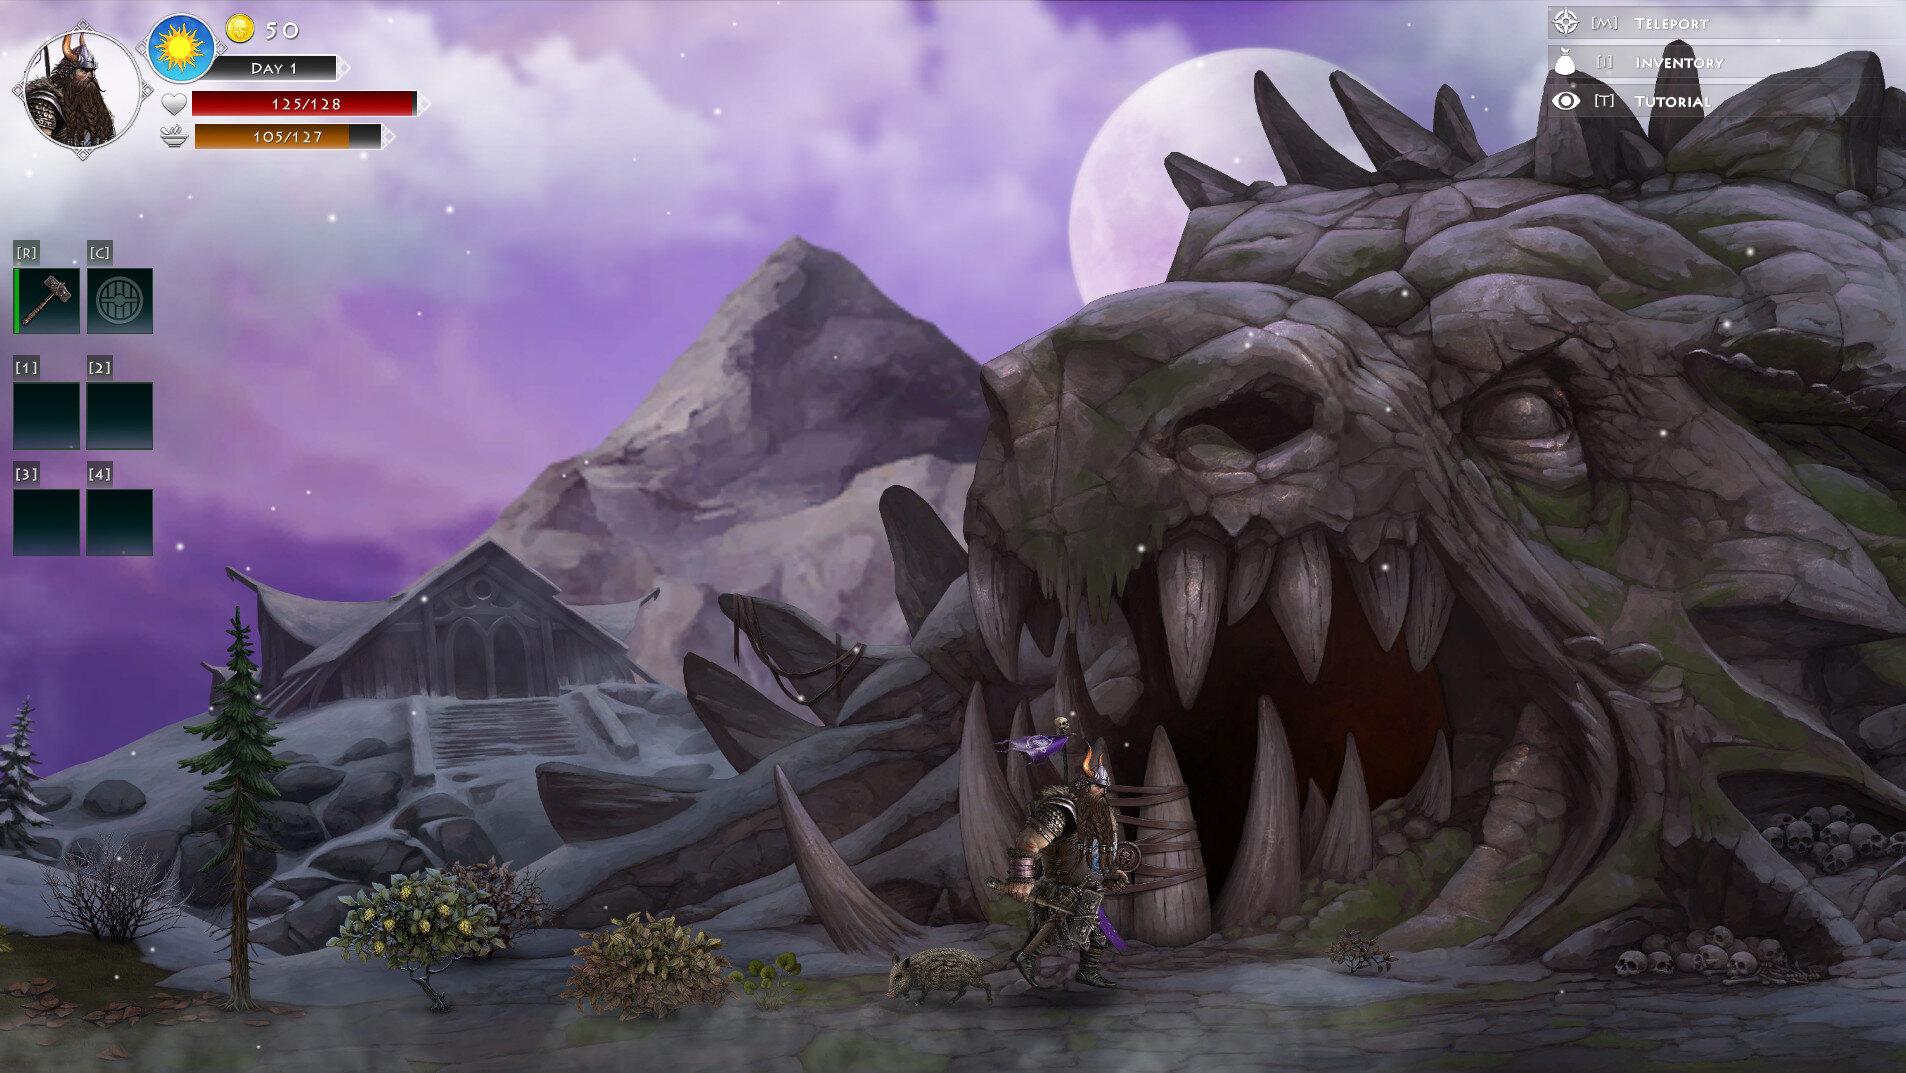 dungeon view (Promo art)